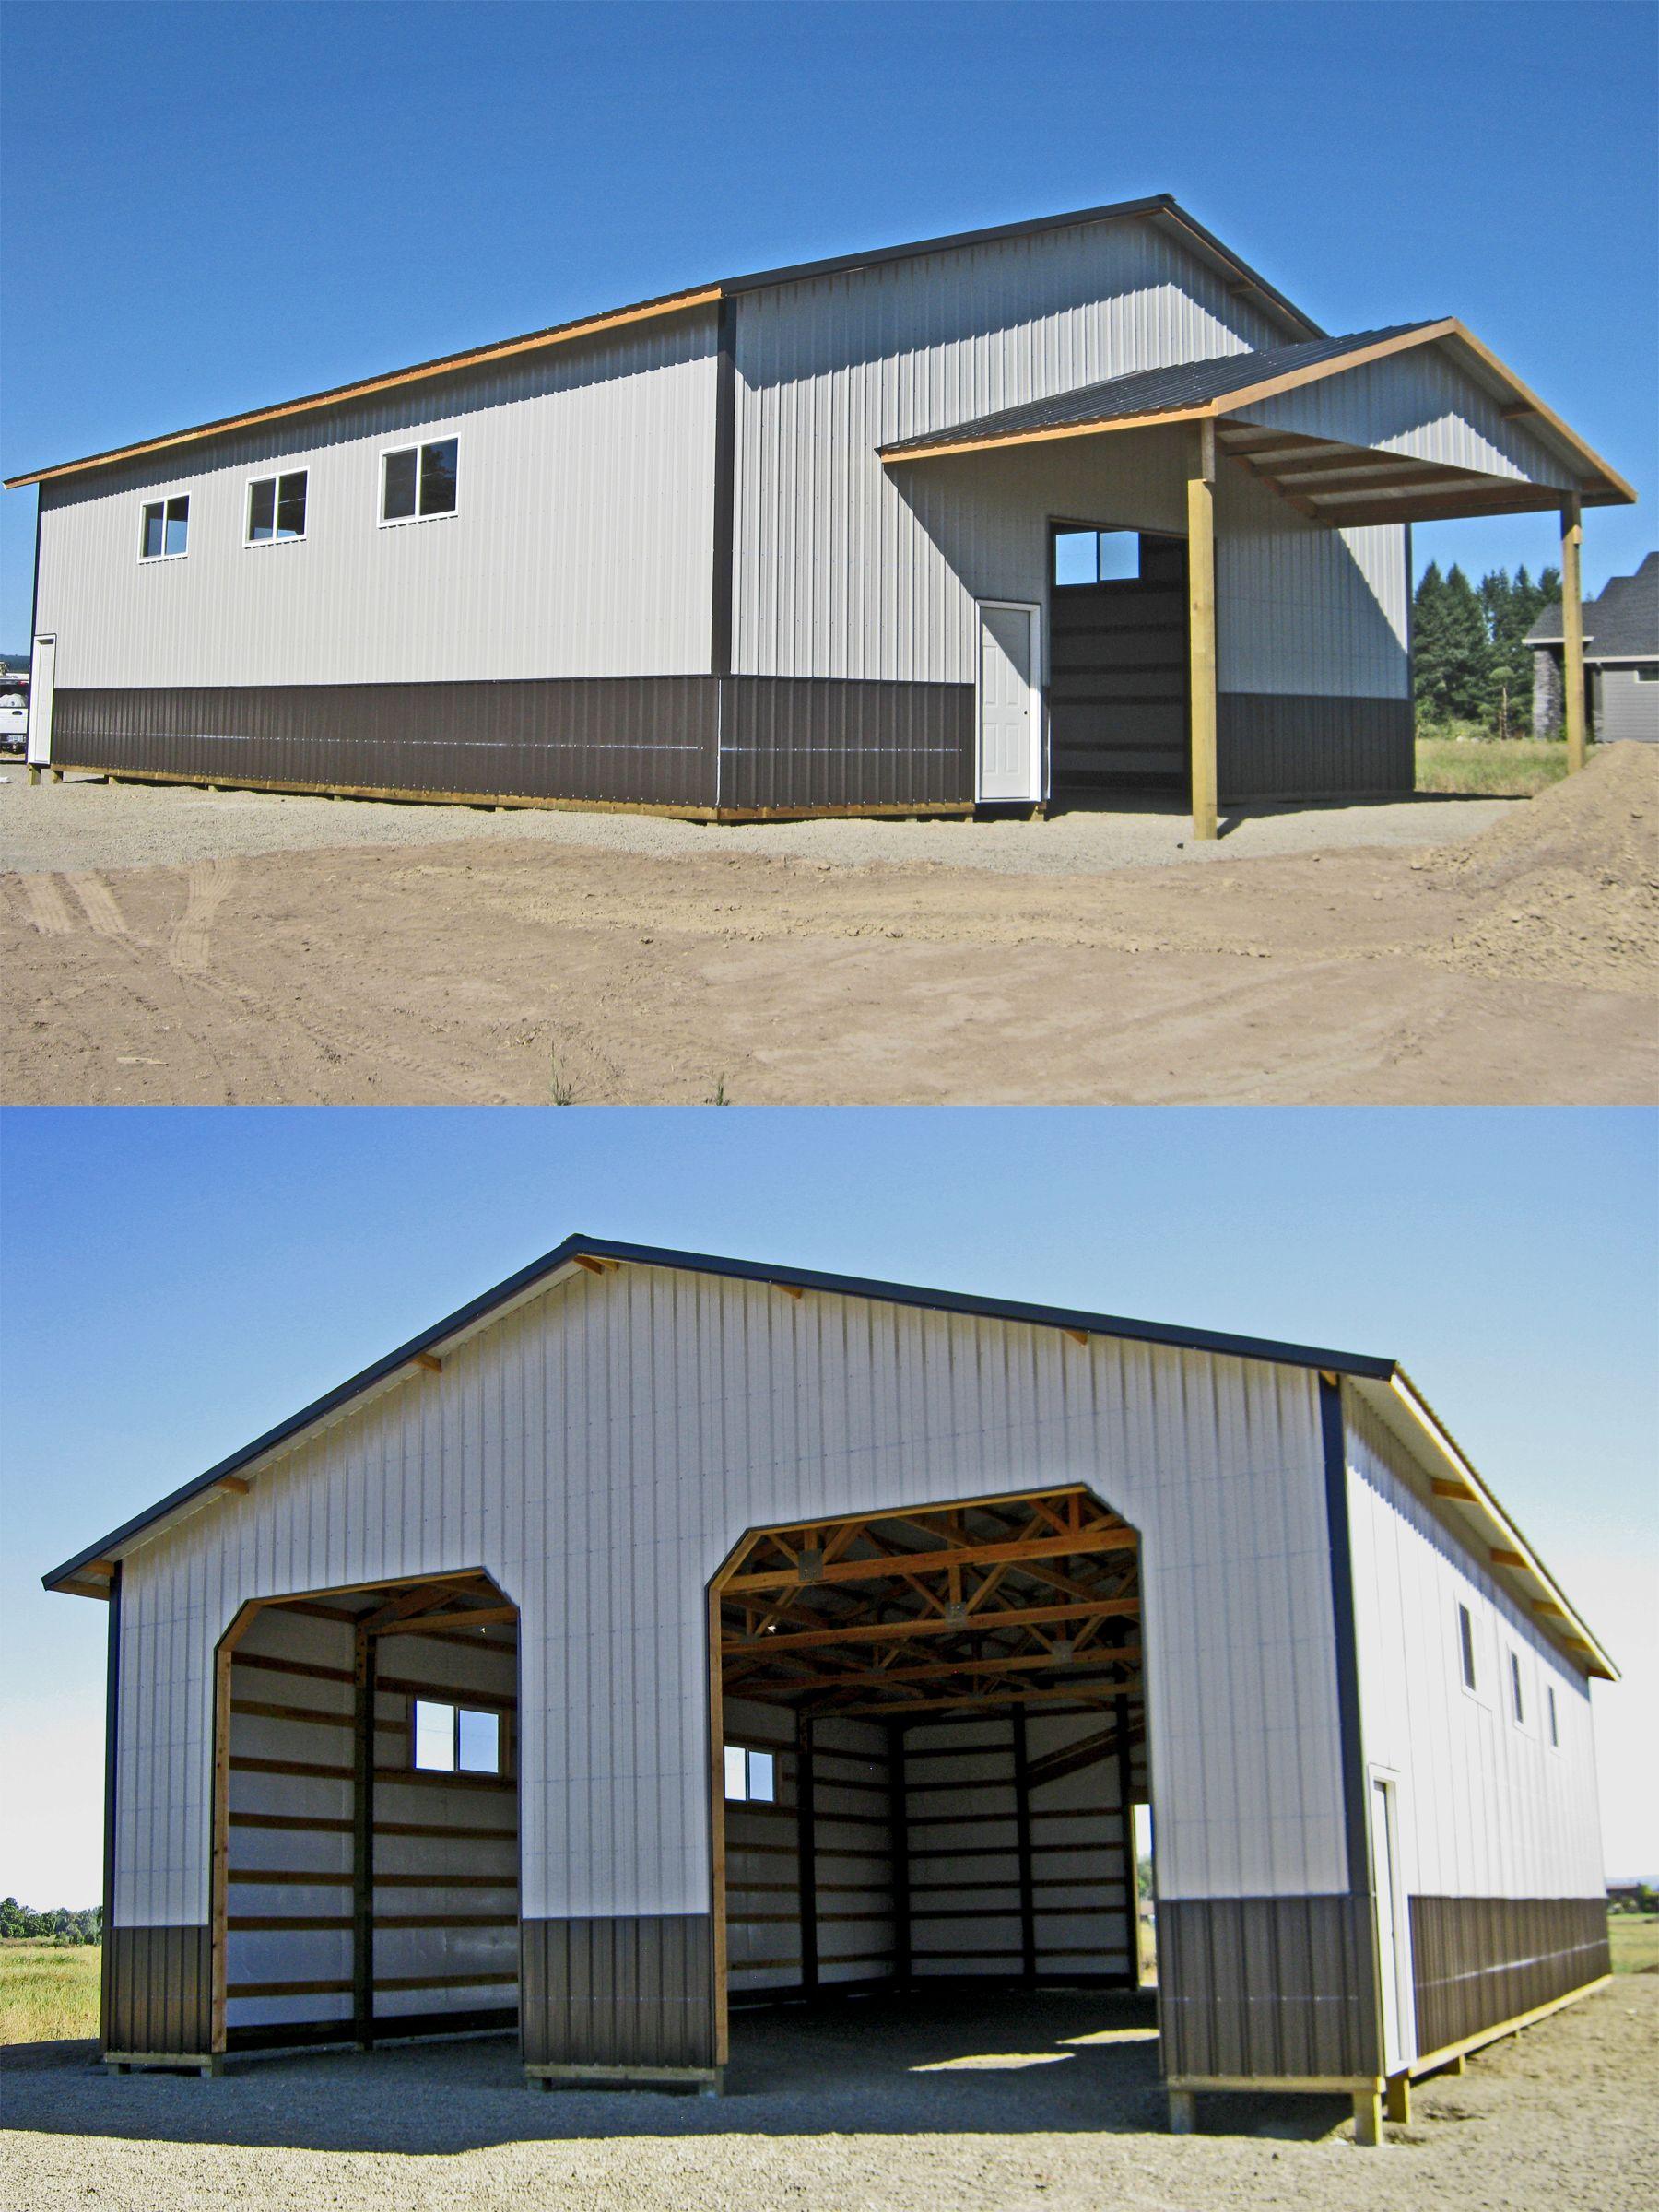 40 X 60 X 16 Pole Building With 4 Metal Wainscot Gable